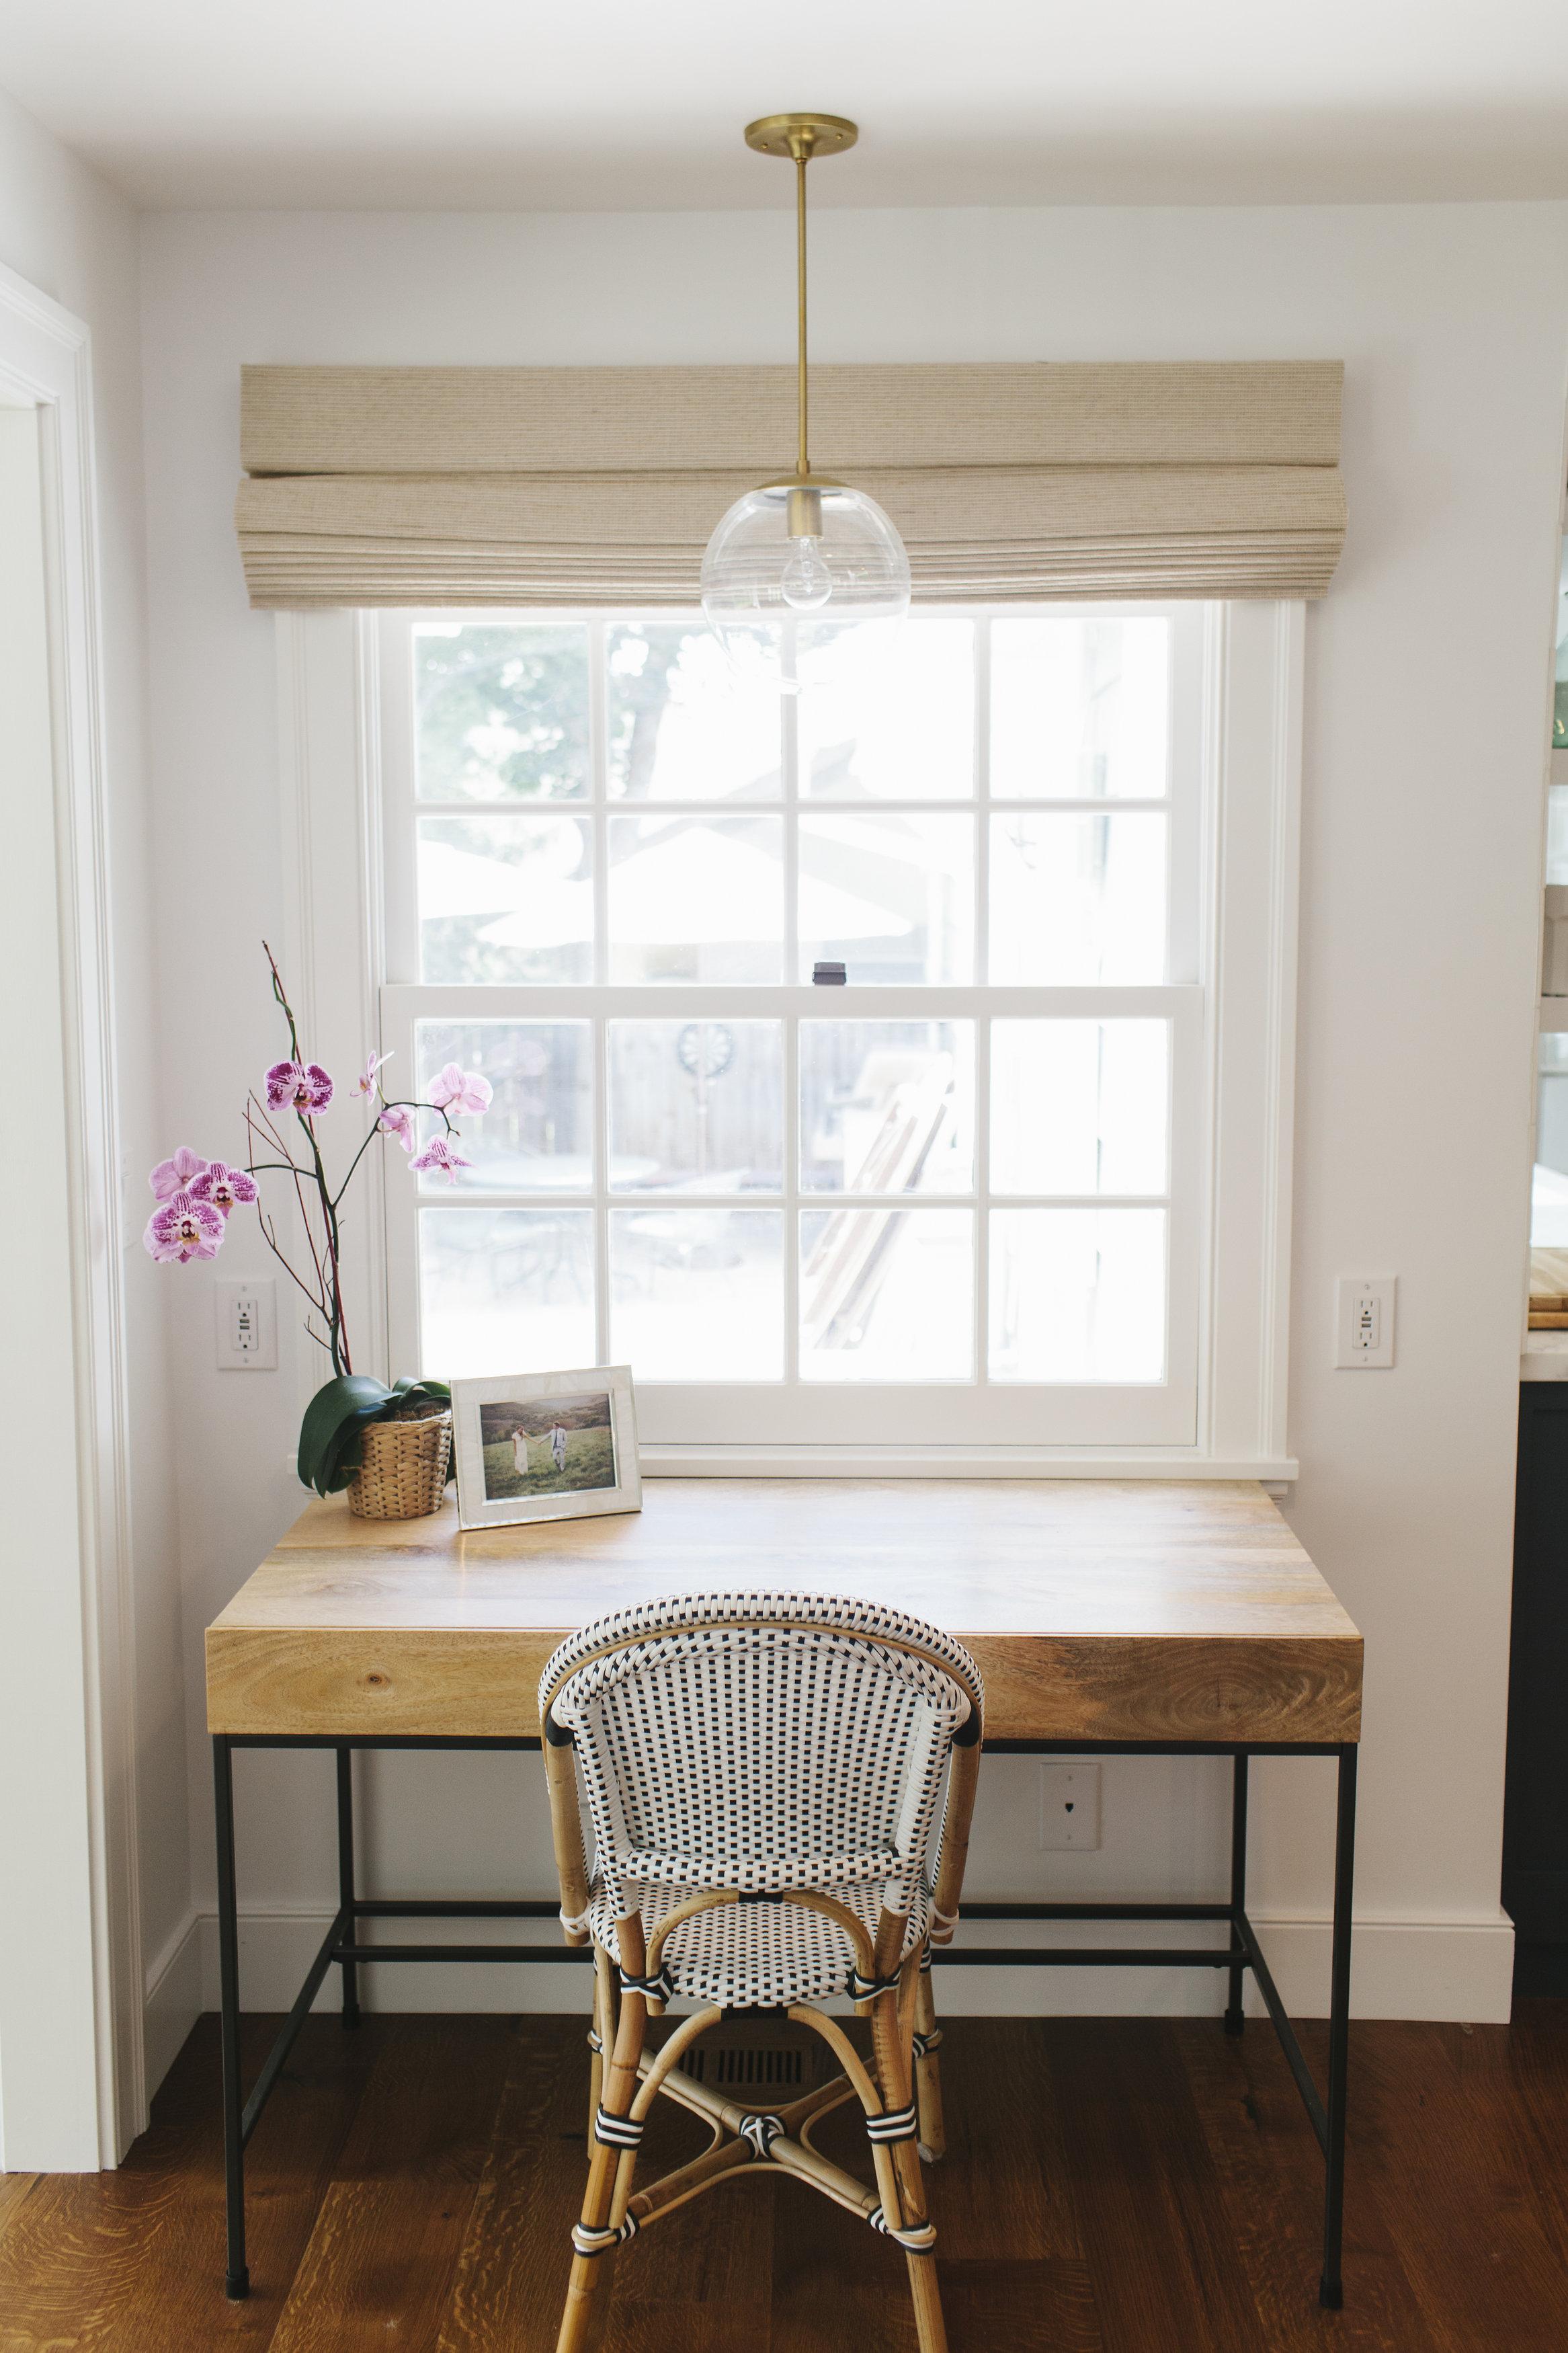 Desk in the kitchen || Studio McGee